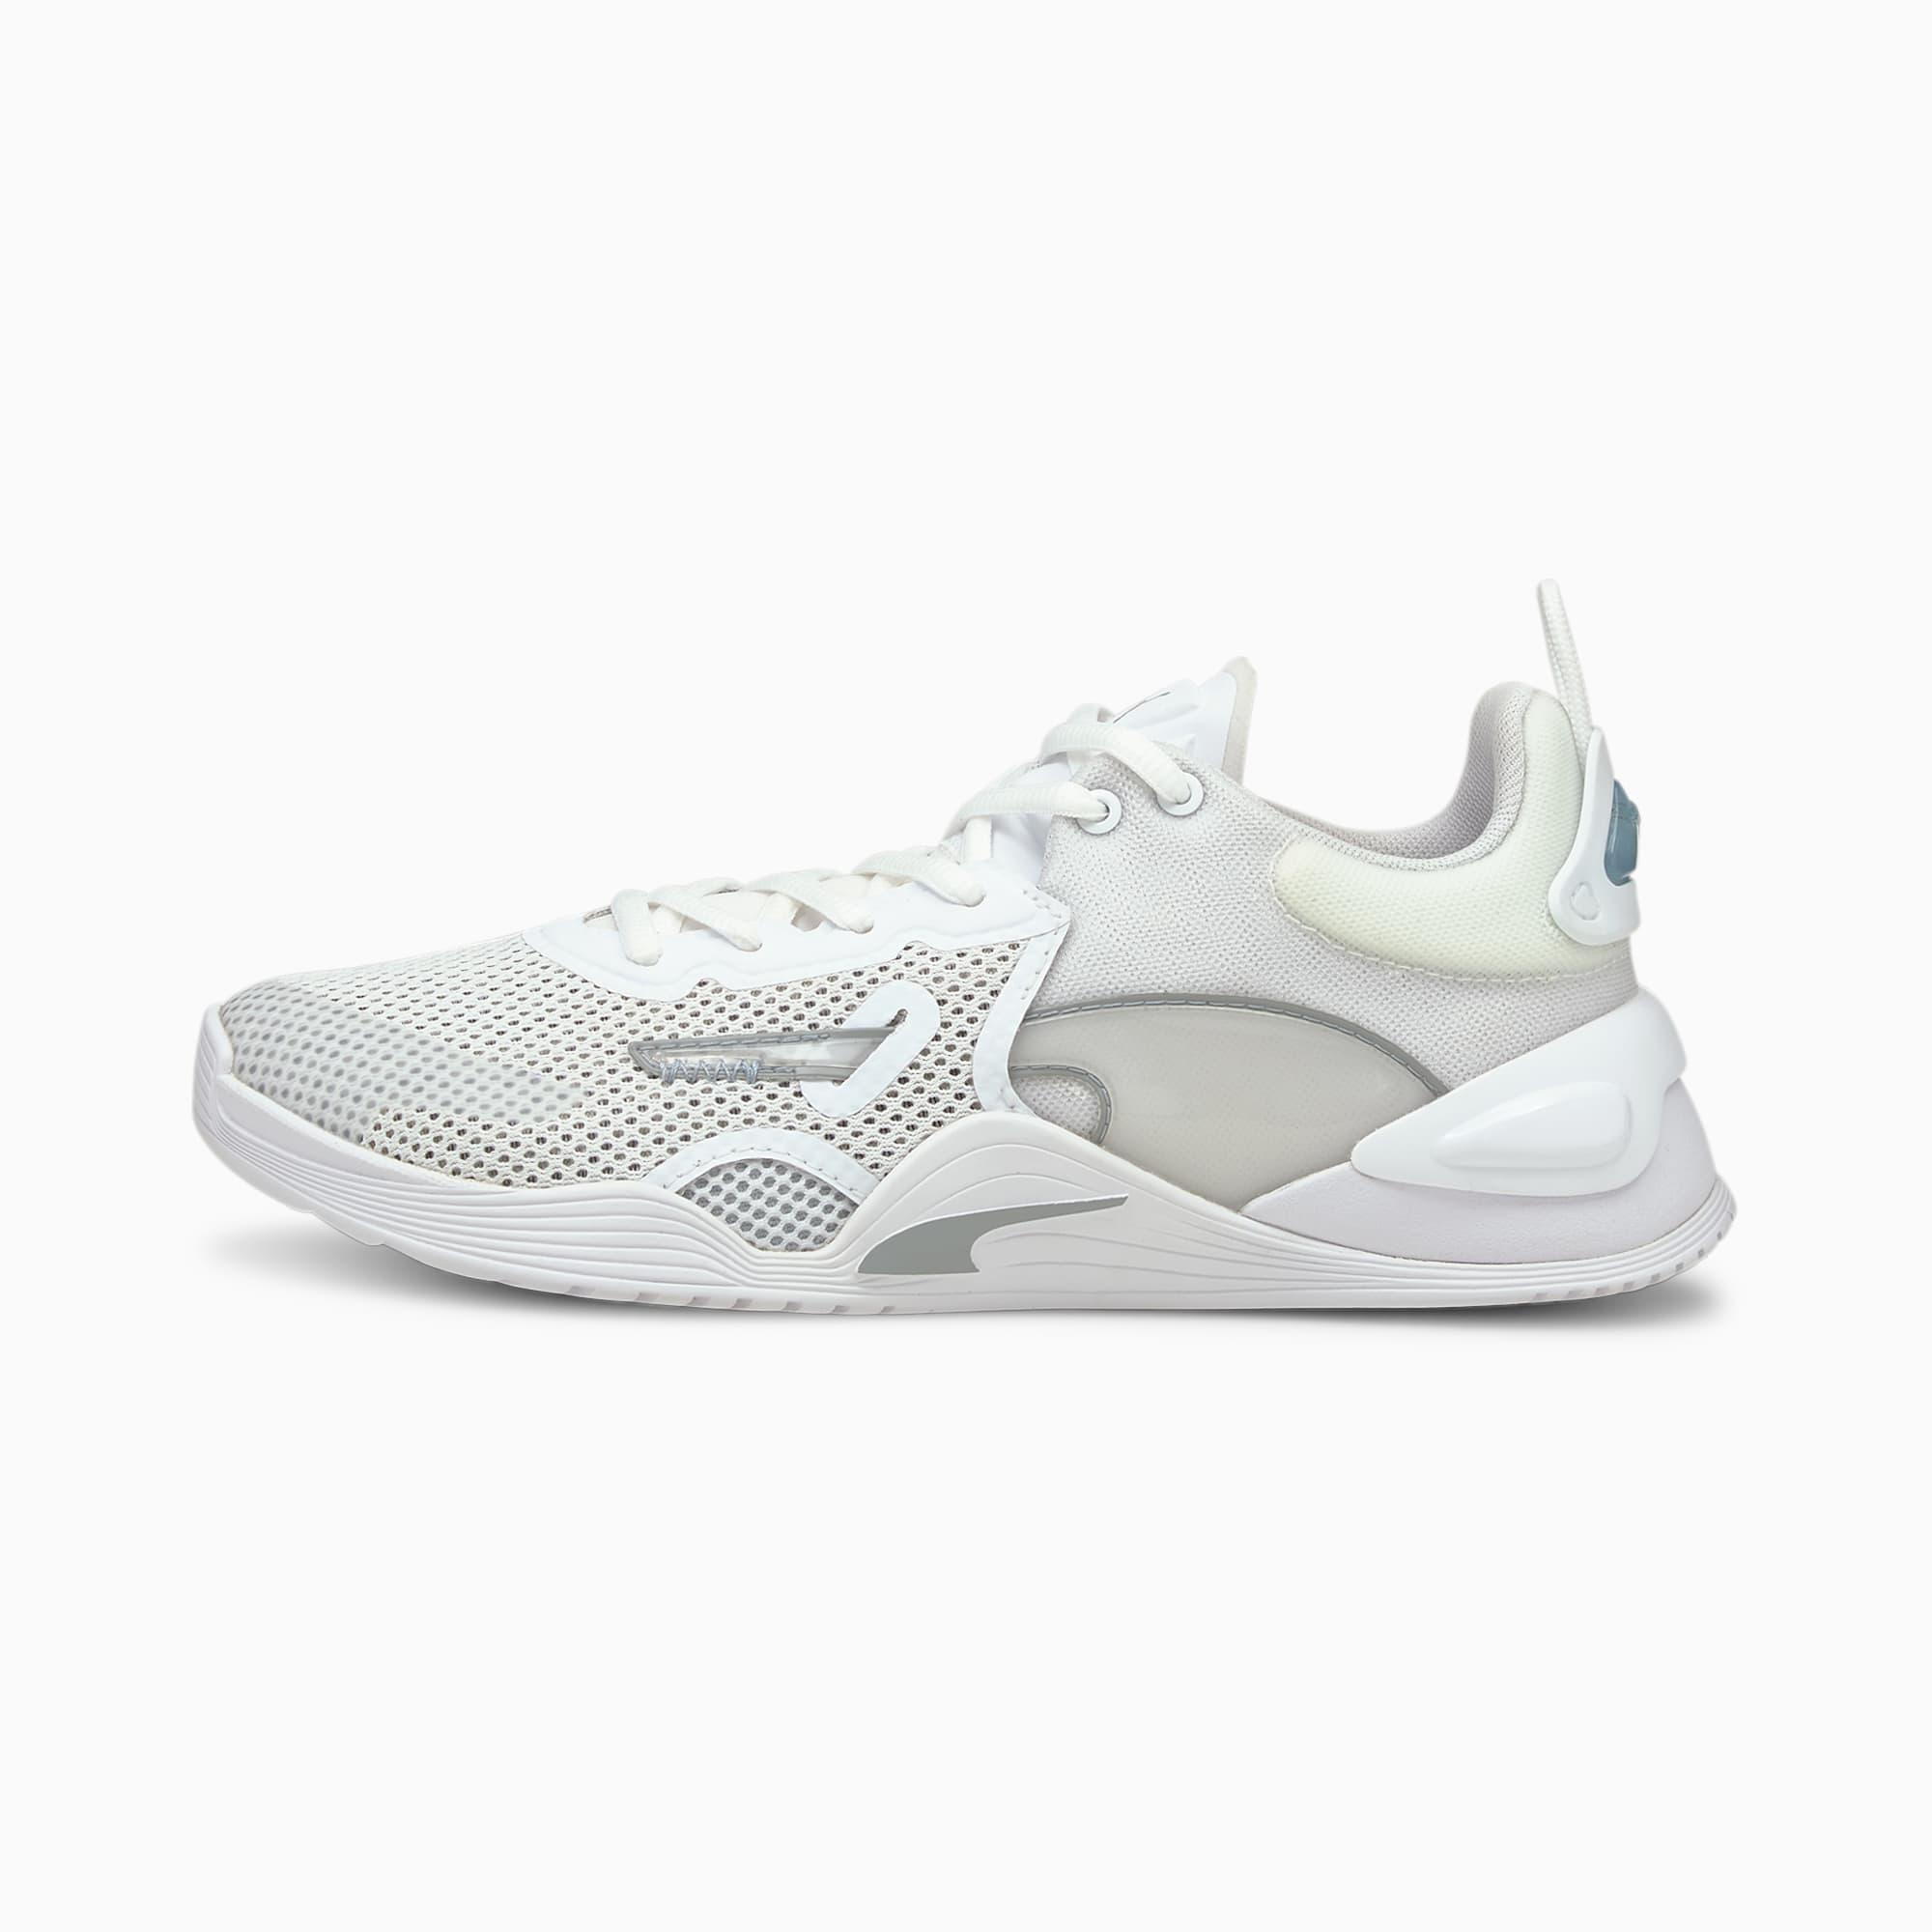 FUSE Women's Training Shoes